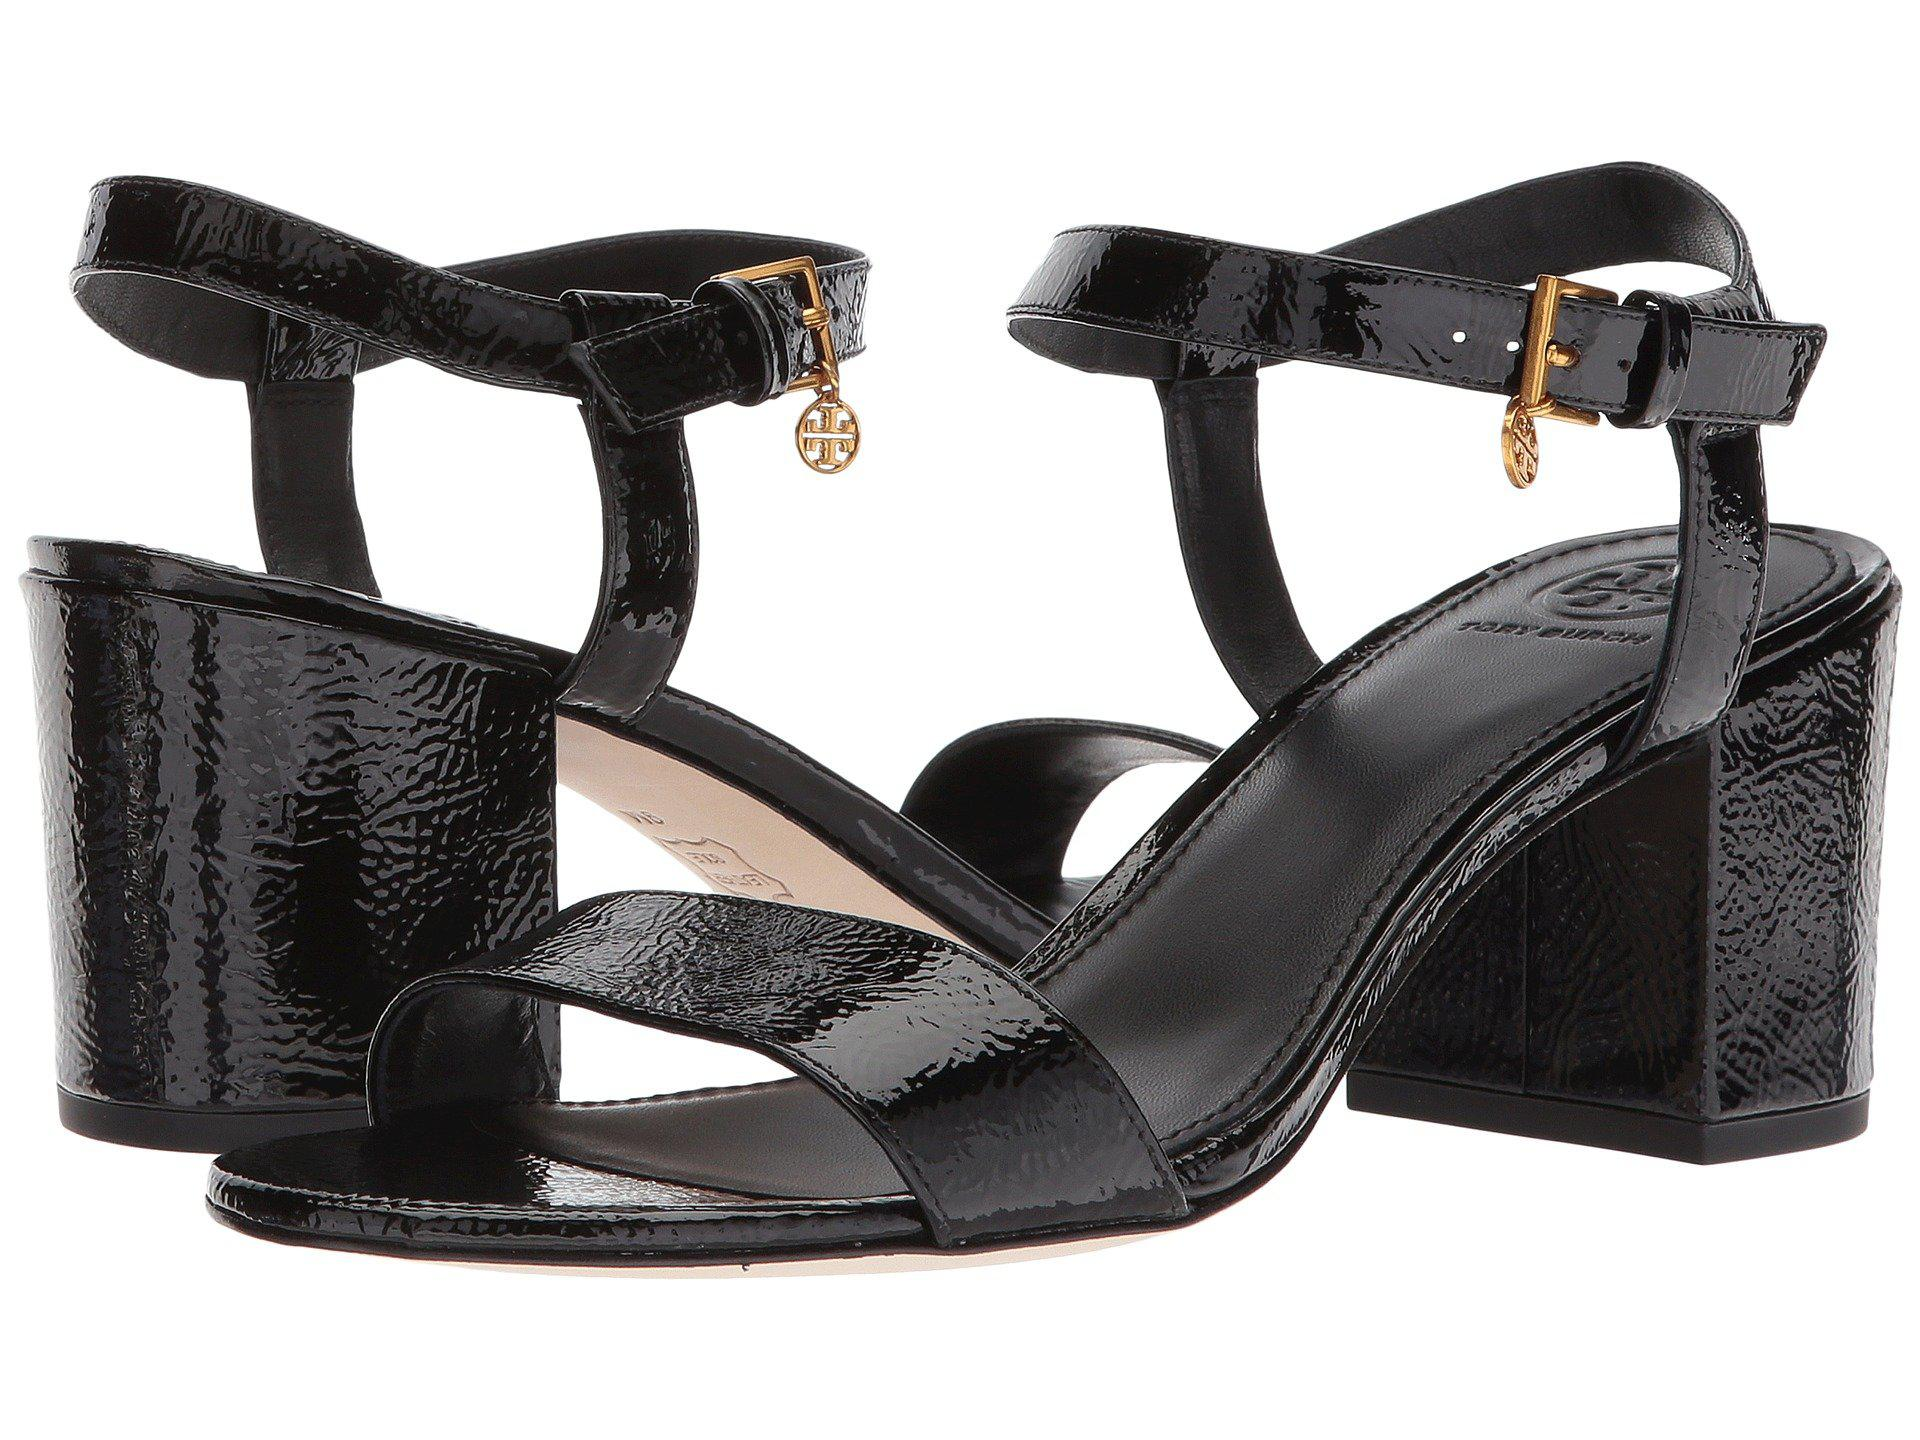 03c19762210e Lyst - Tory Burch Laurel 65m Ankle Strap Sandal in Black